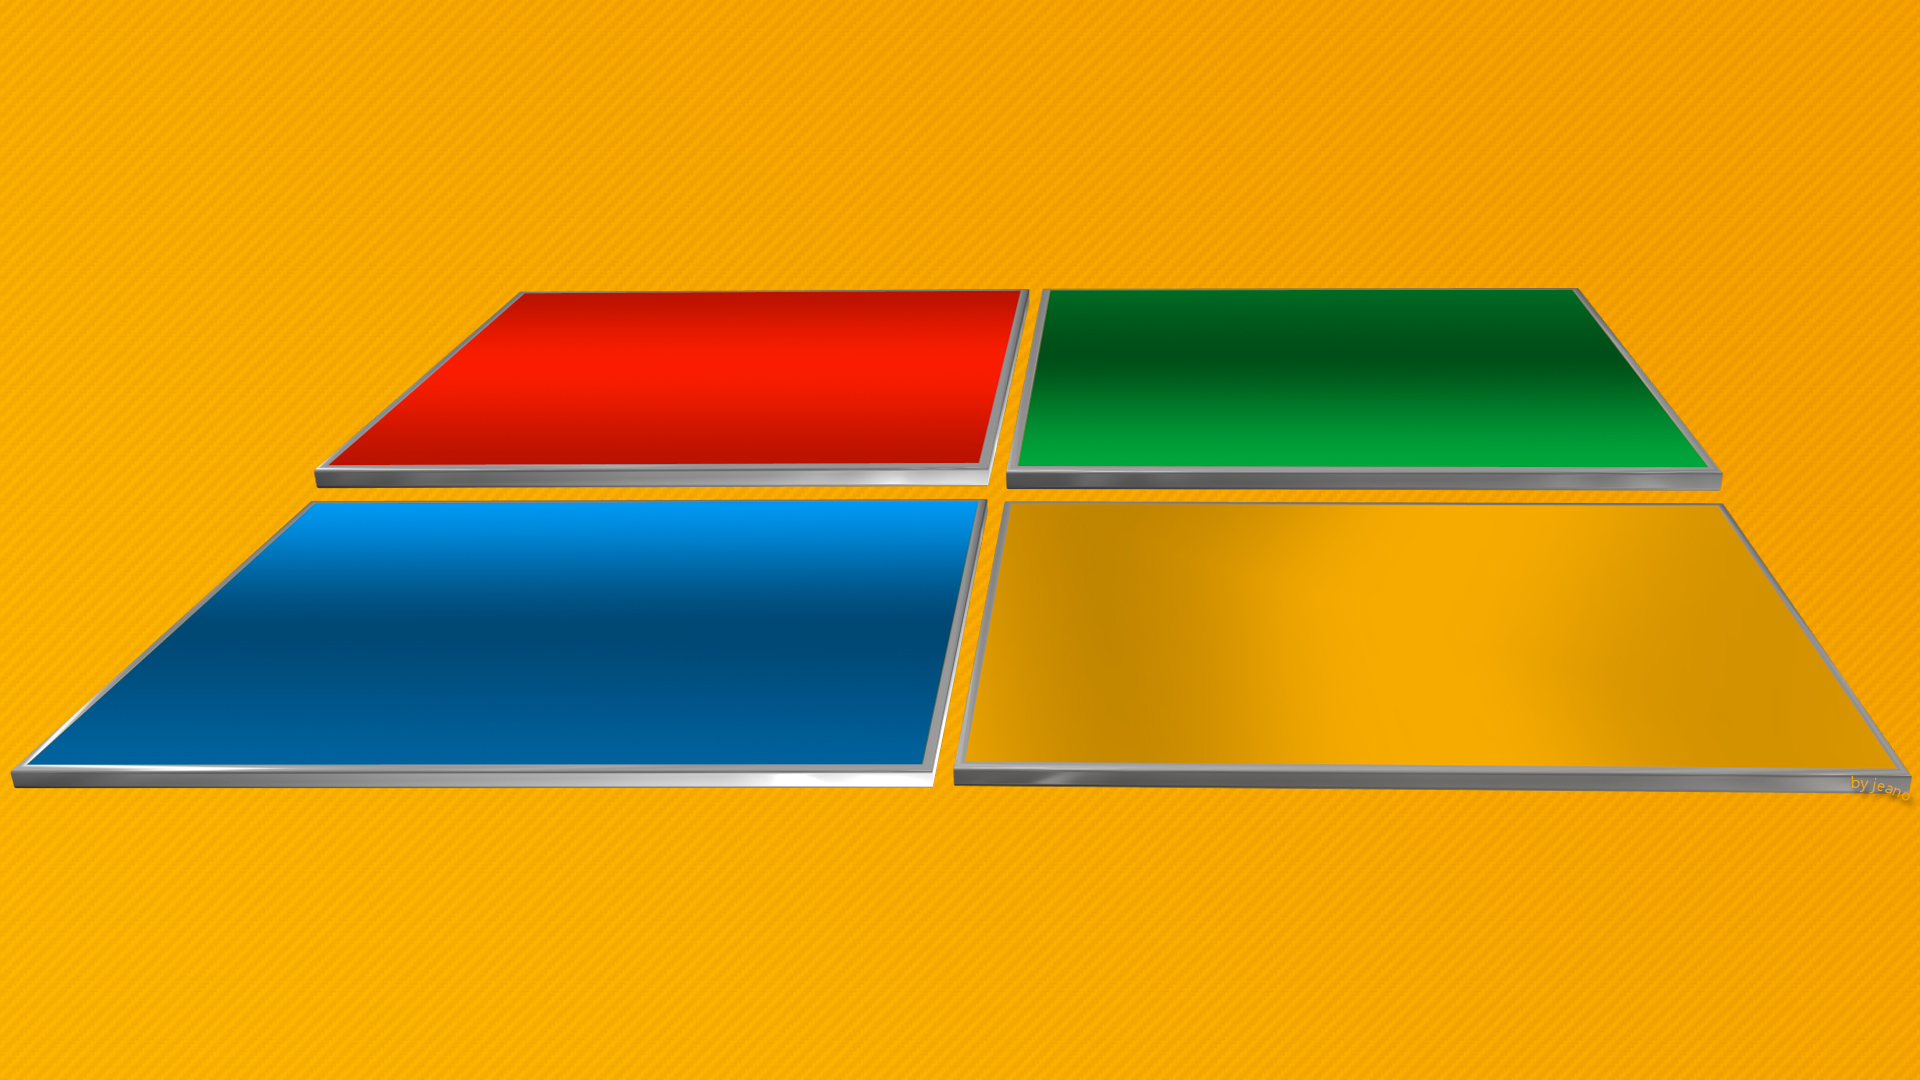 wallpaper windows 8 1 by zeanoel customization wallpaper mac pc os 1920x1080